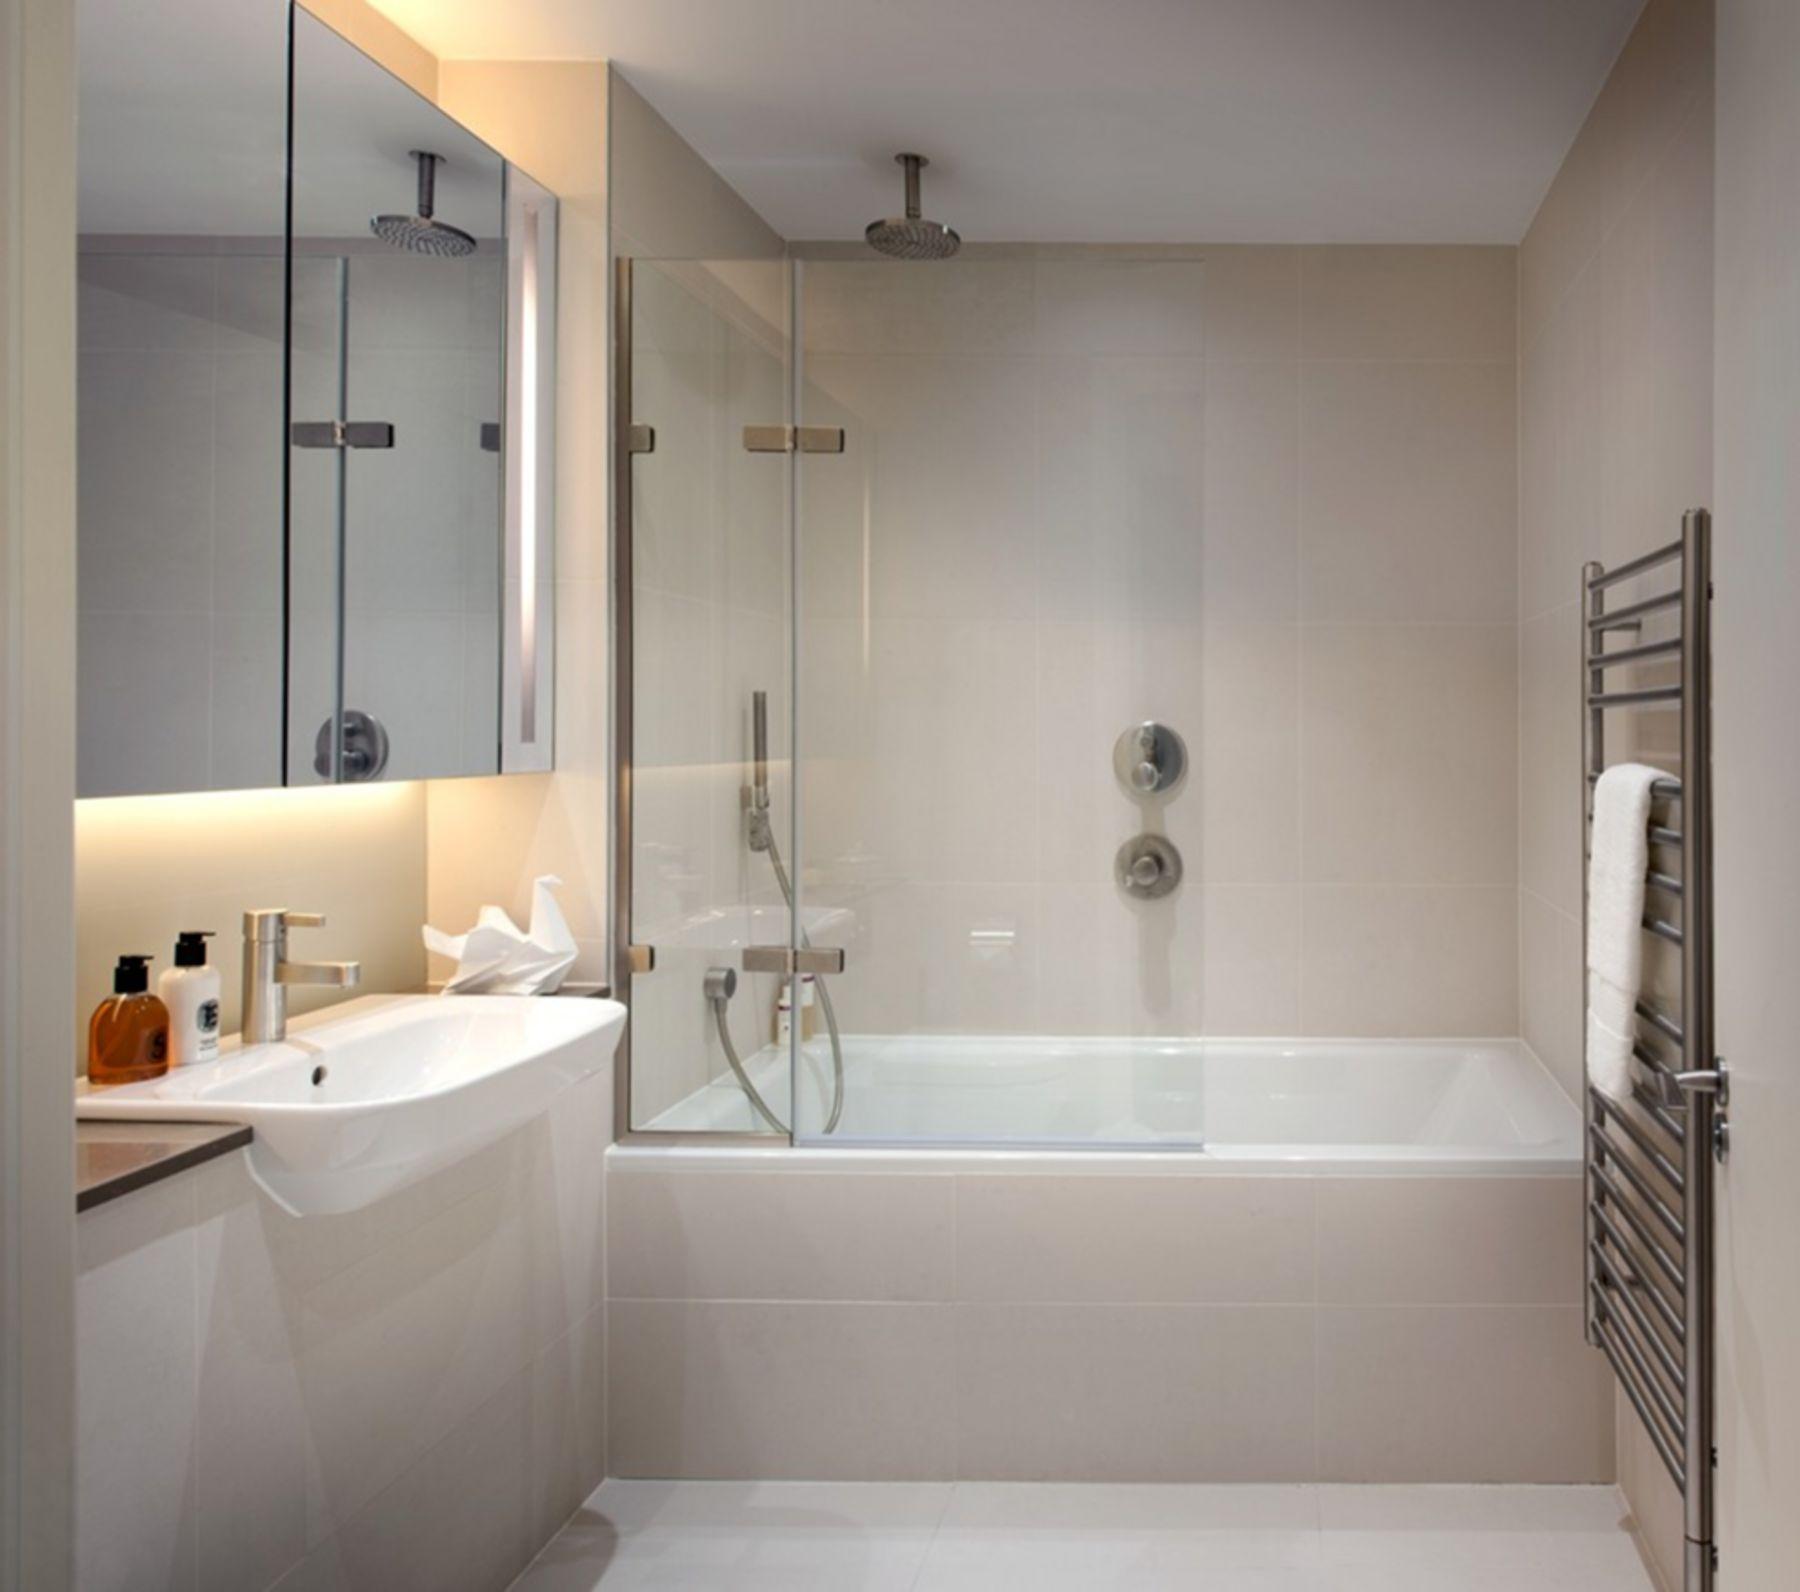 12 Interesting Bathroom Design Ideas With Bathtub For Your Minimalist Home Bathroom Design Bathroom Design Small Modern Bathroom Design Small